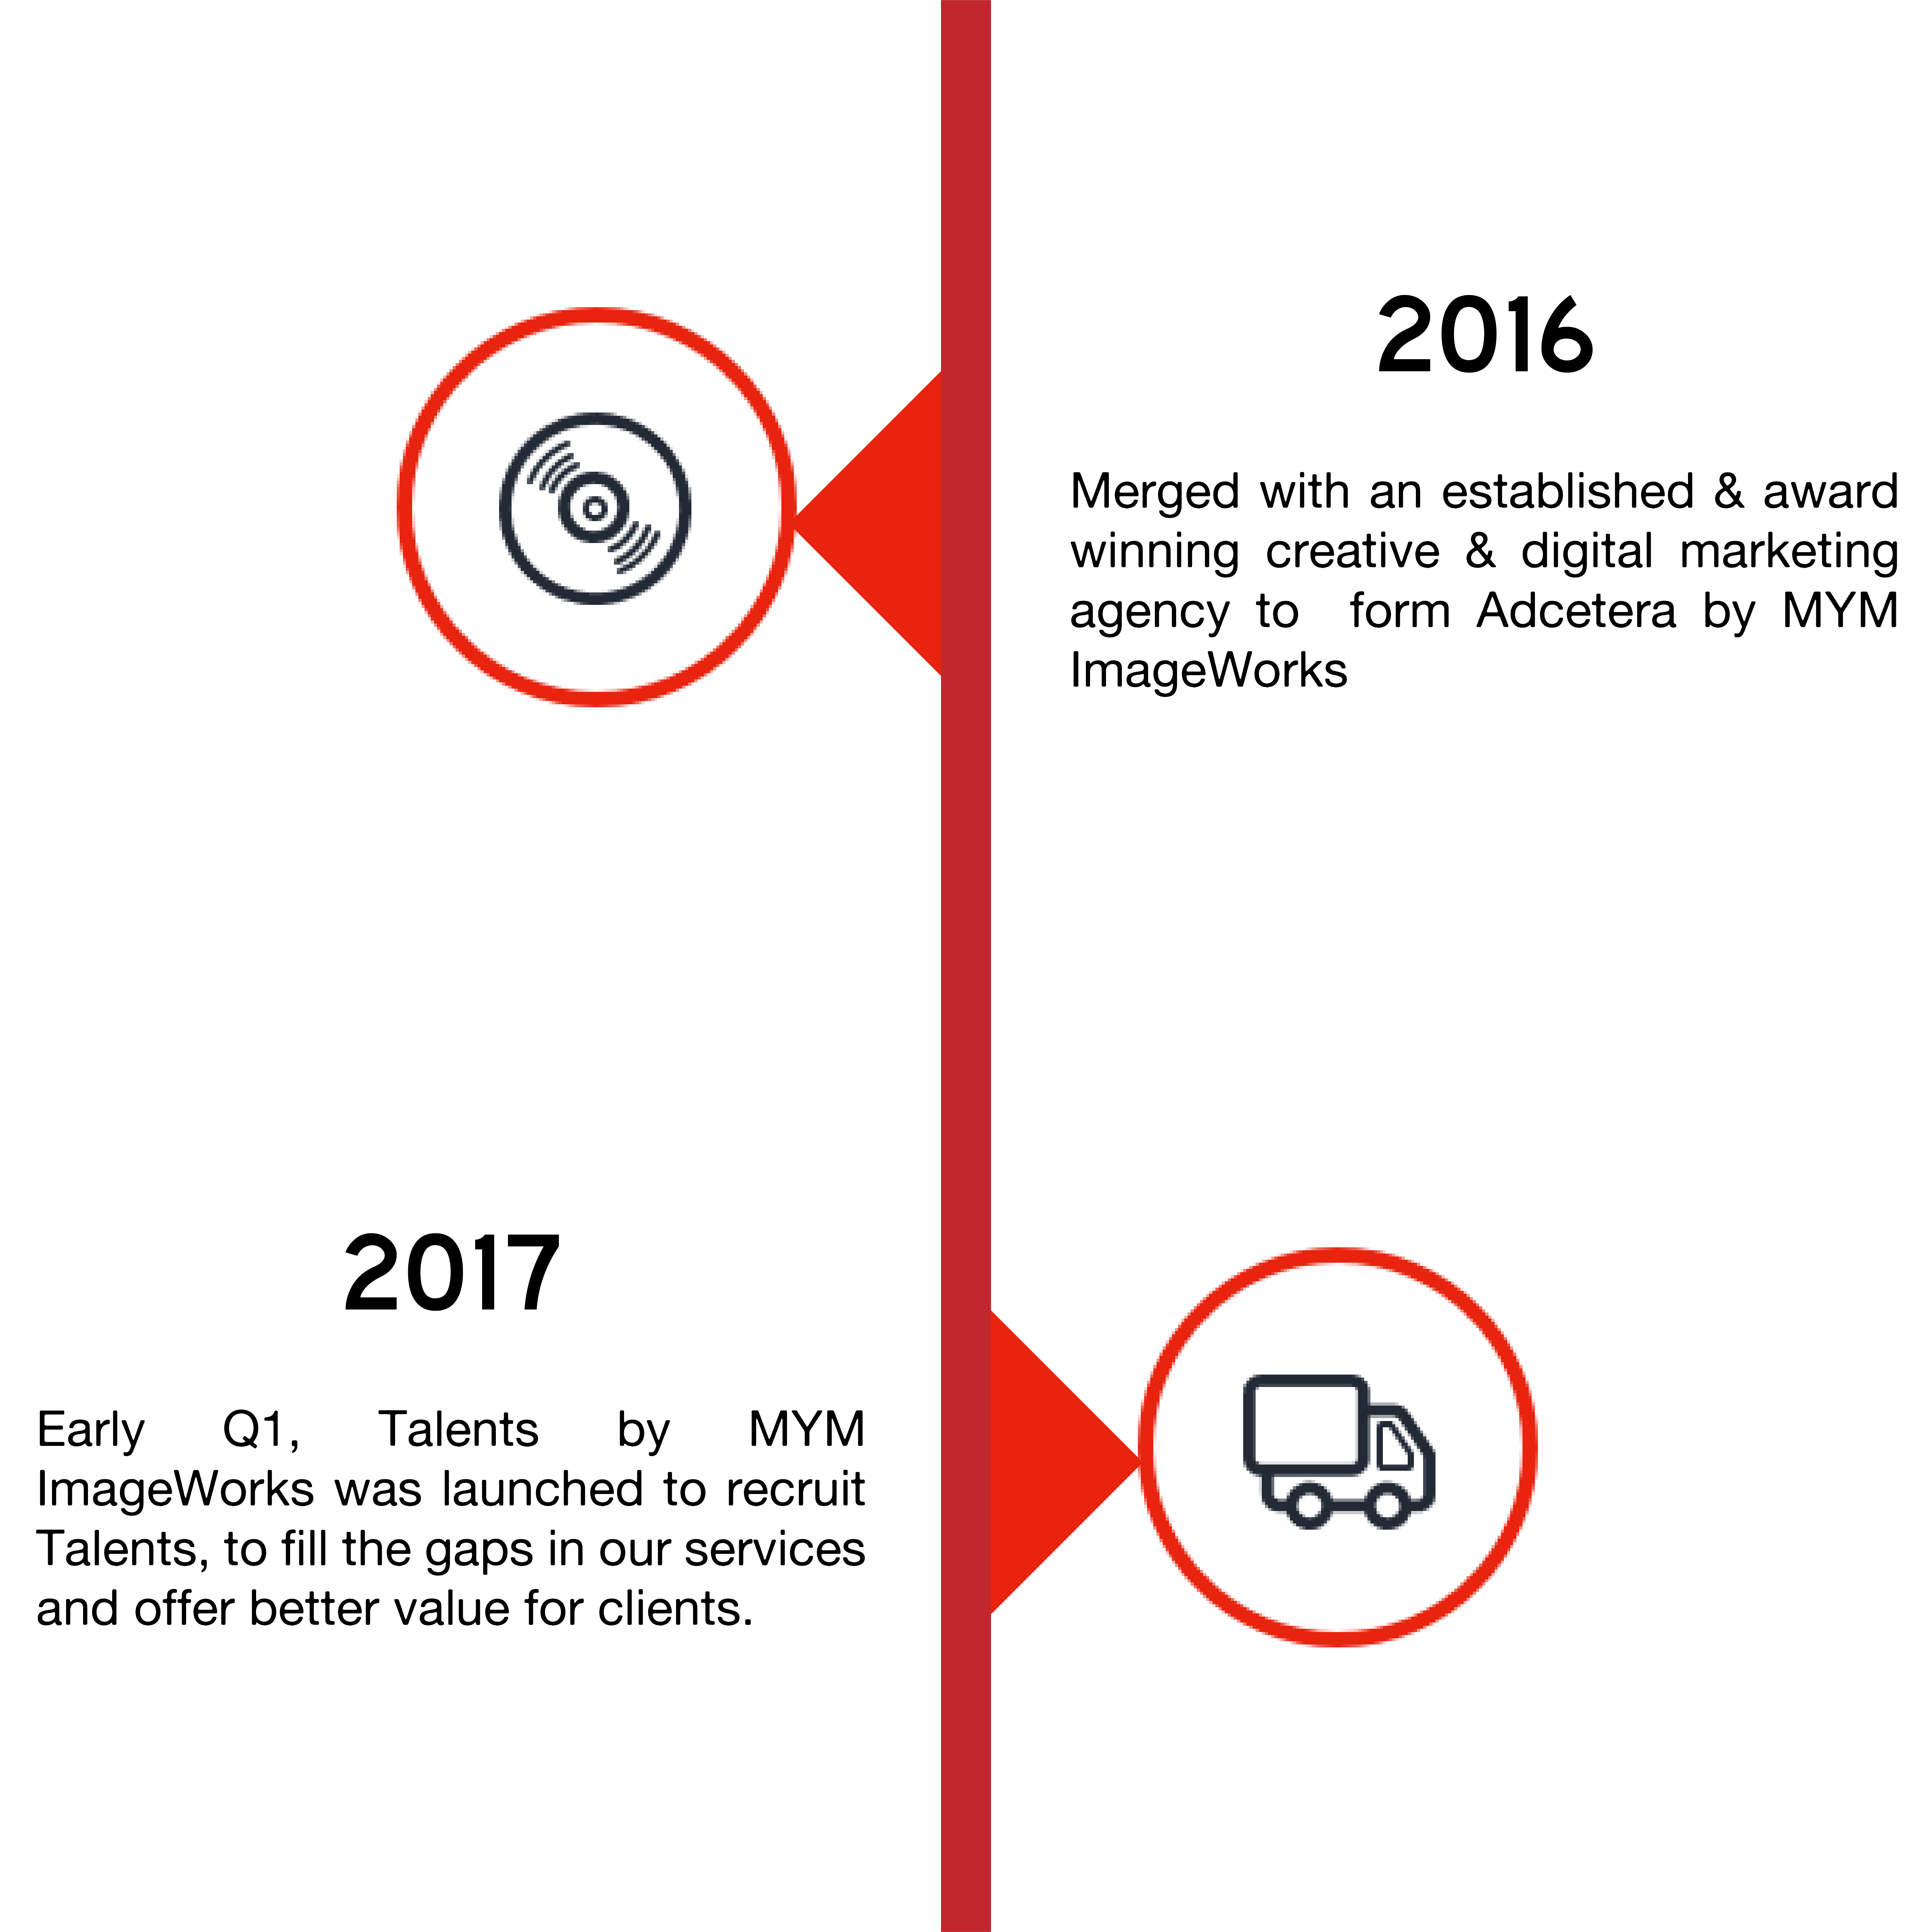 Adcetera-Talents-MYM 2016-2017